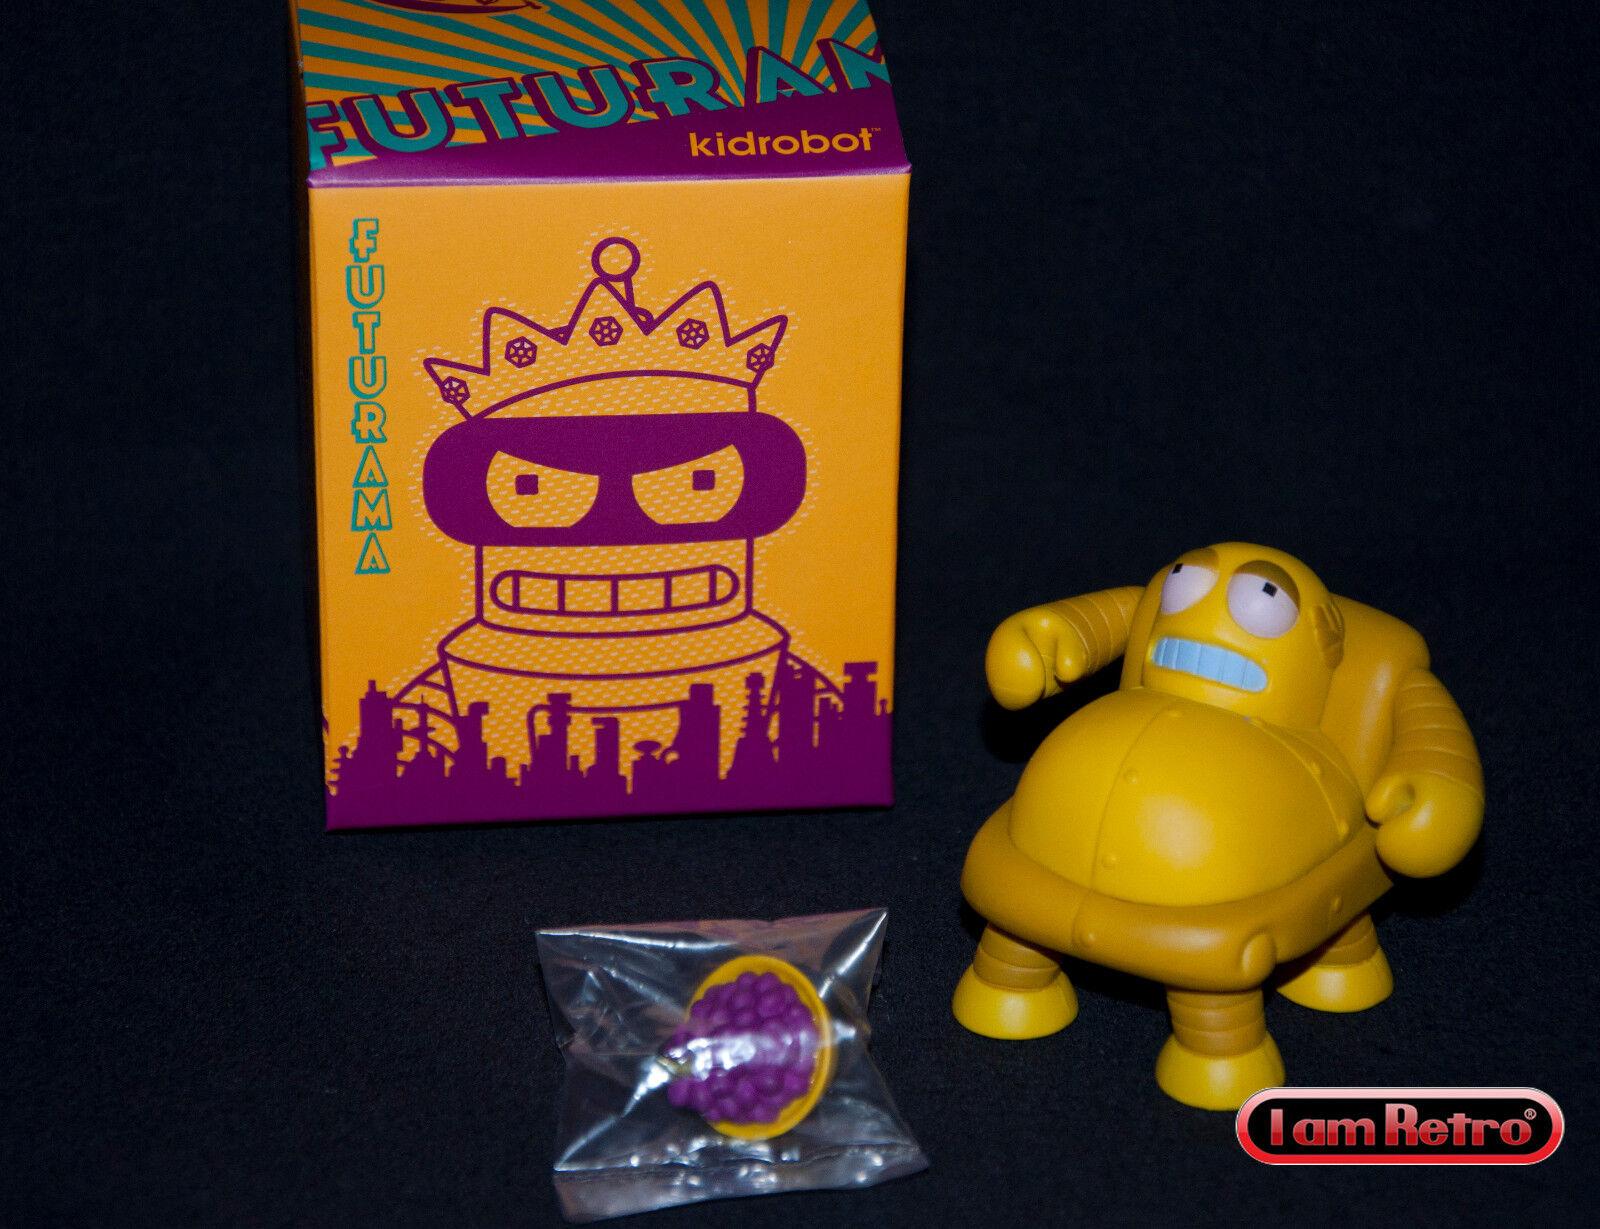 Hedonism Bot - Futurama Series 2 Kidrobot 3 inch Vinyl Figure Brand New in Box